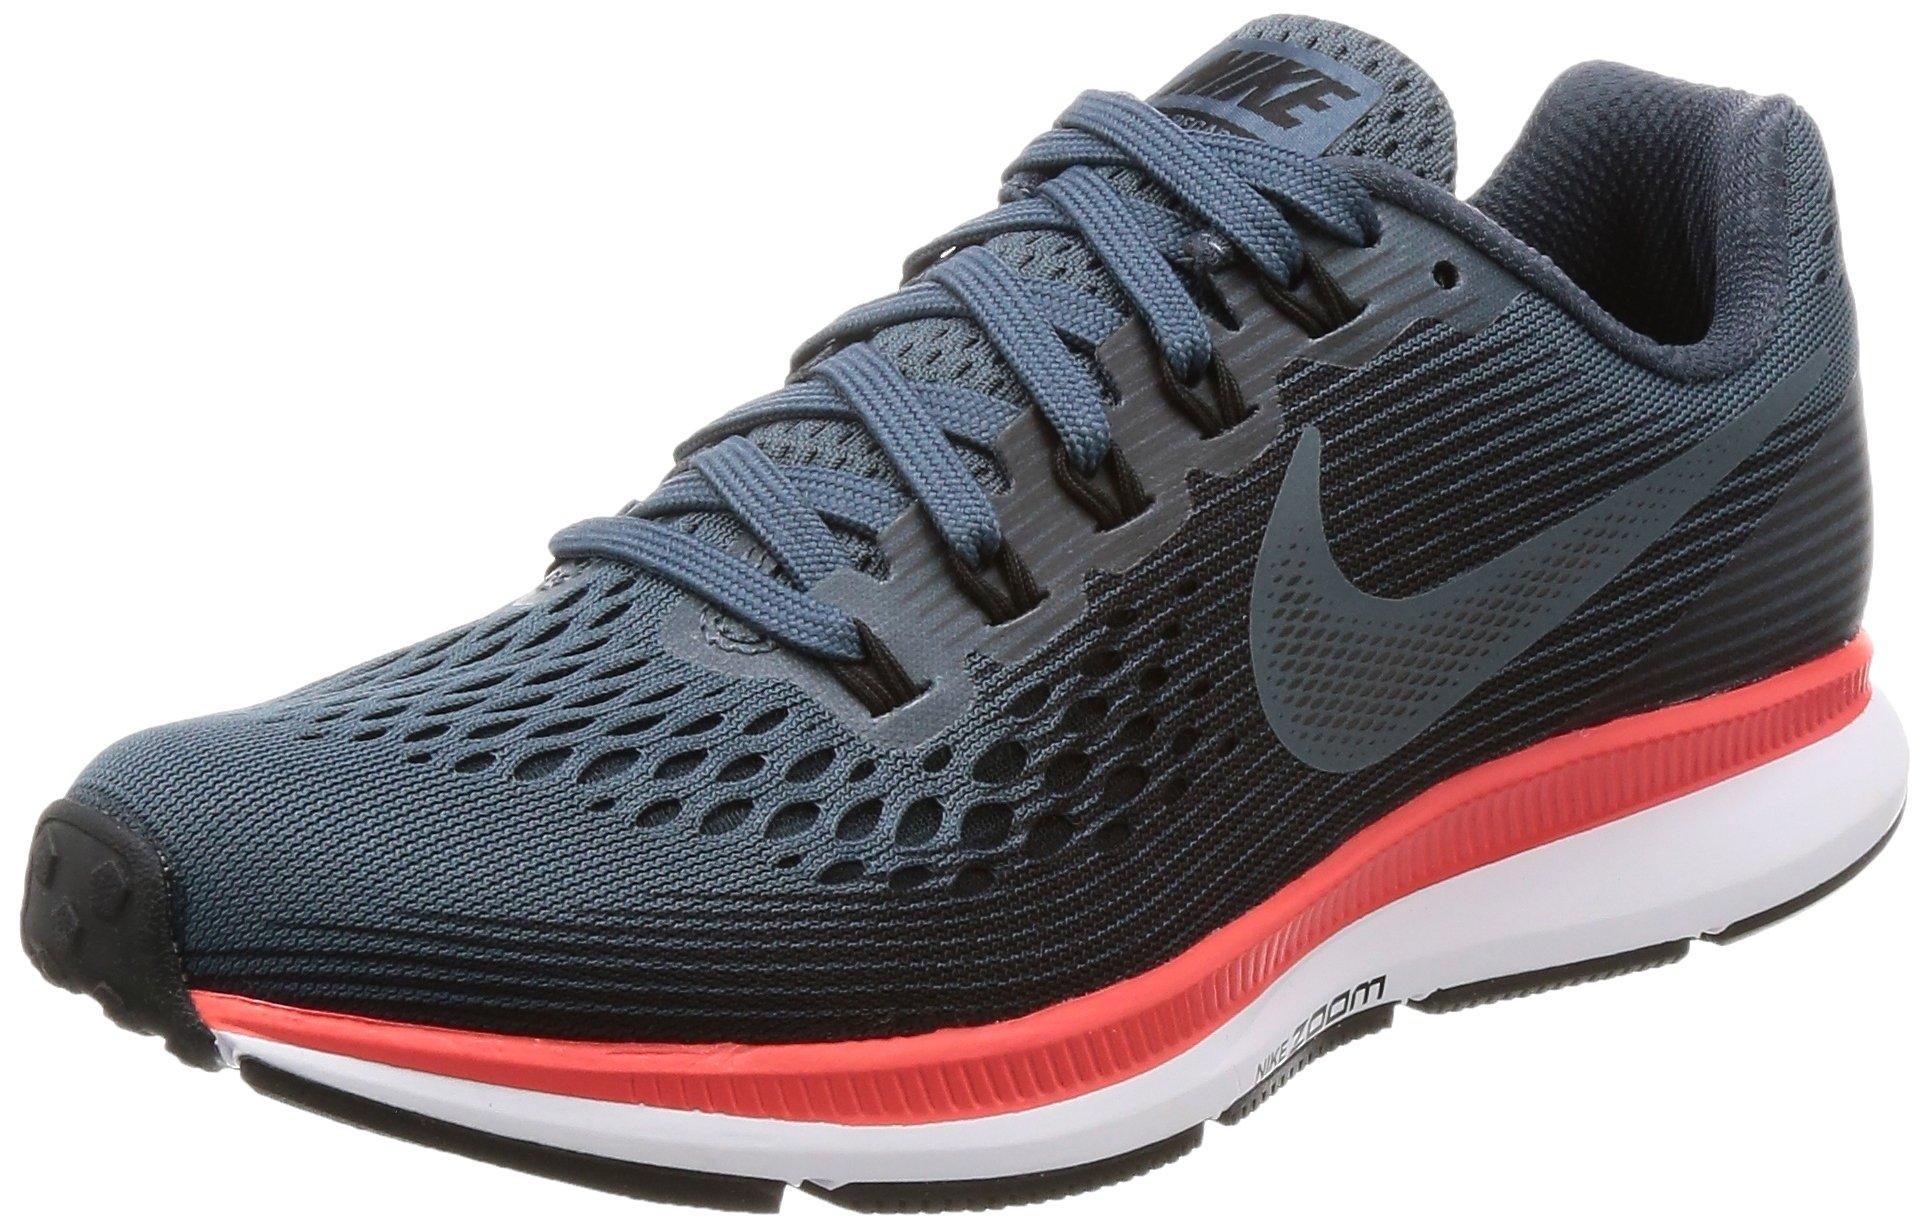 Nike WMNS Air Zoom Pegasus 34 880560-403 Blue Fox/Black/Bright Crimson Women's Running Shoes (6)